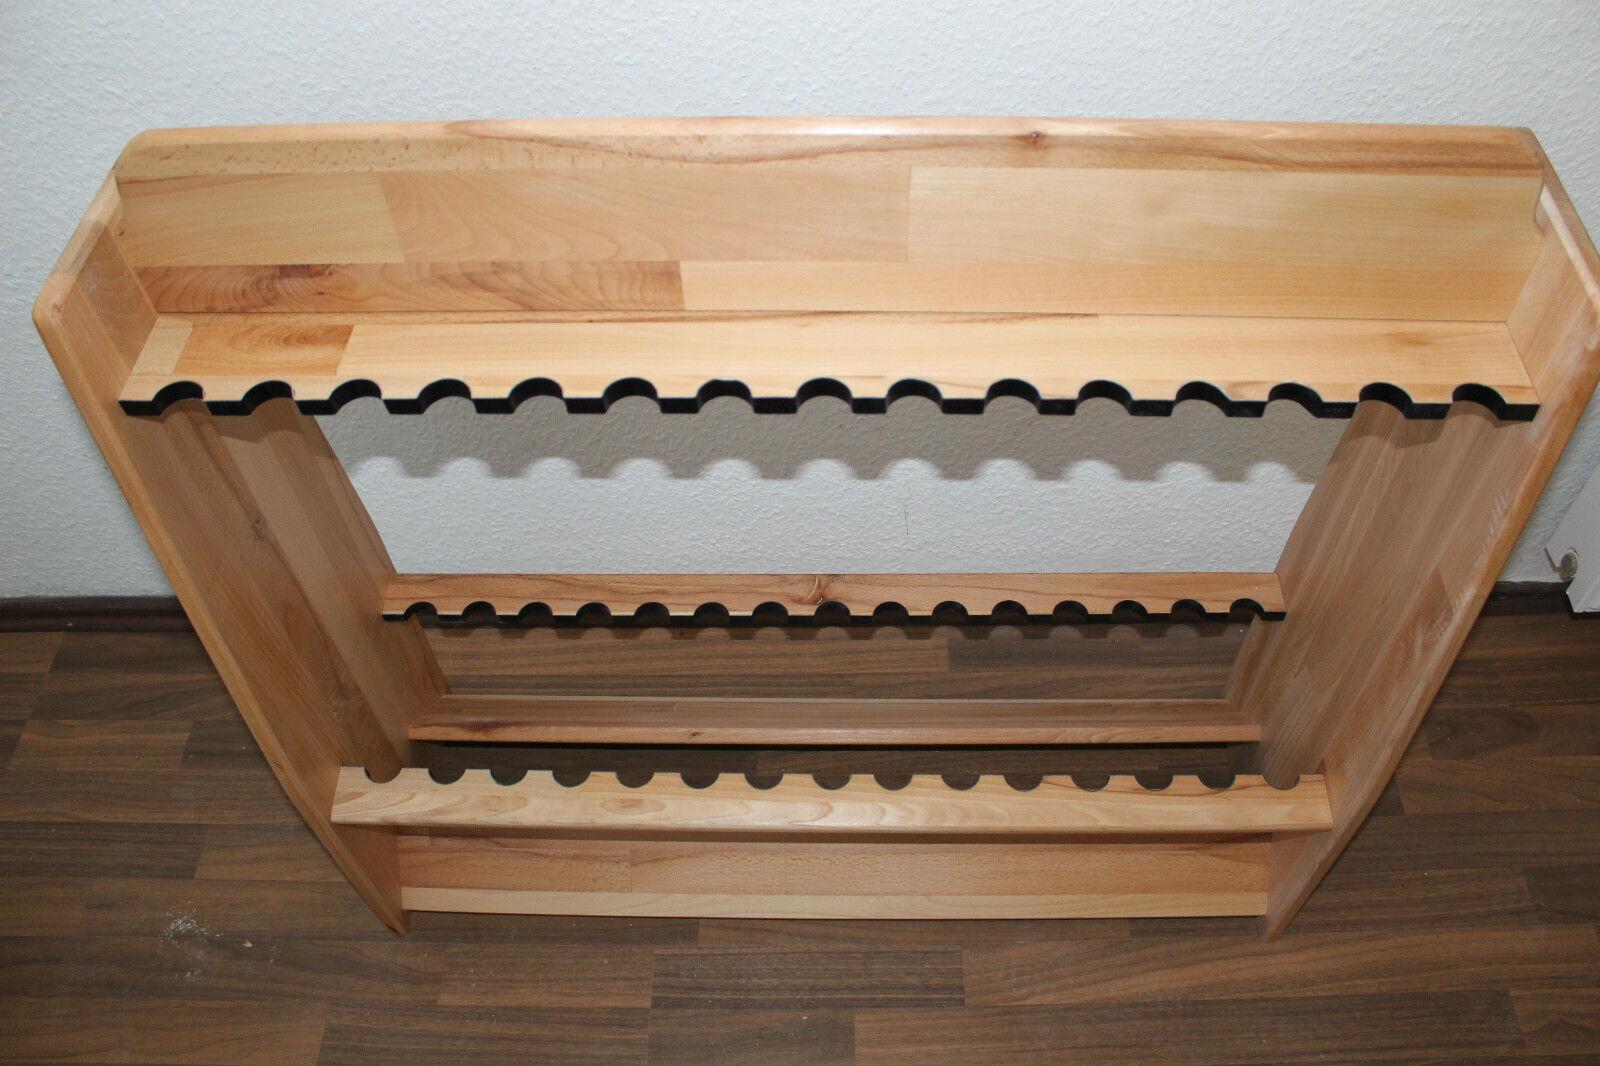 rutenst nder aus massiv holz buche f r 30 ruten eur 59 99 picclick de. Black Bedroom Furniture Sets. Home Design Ideas